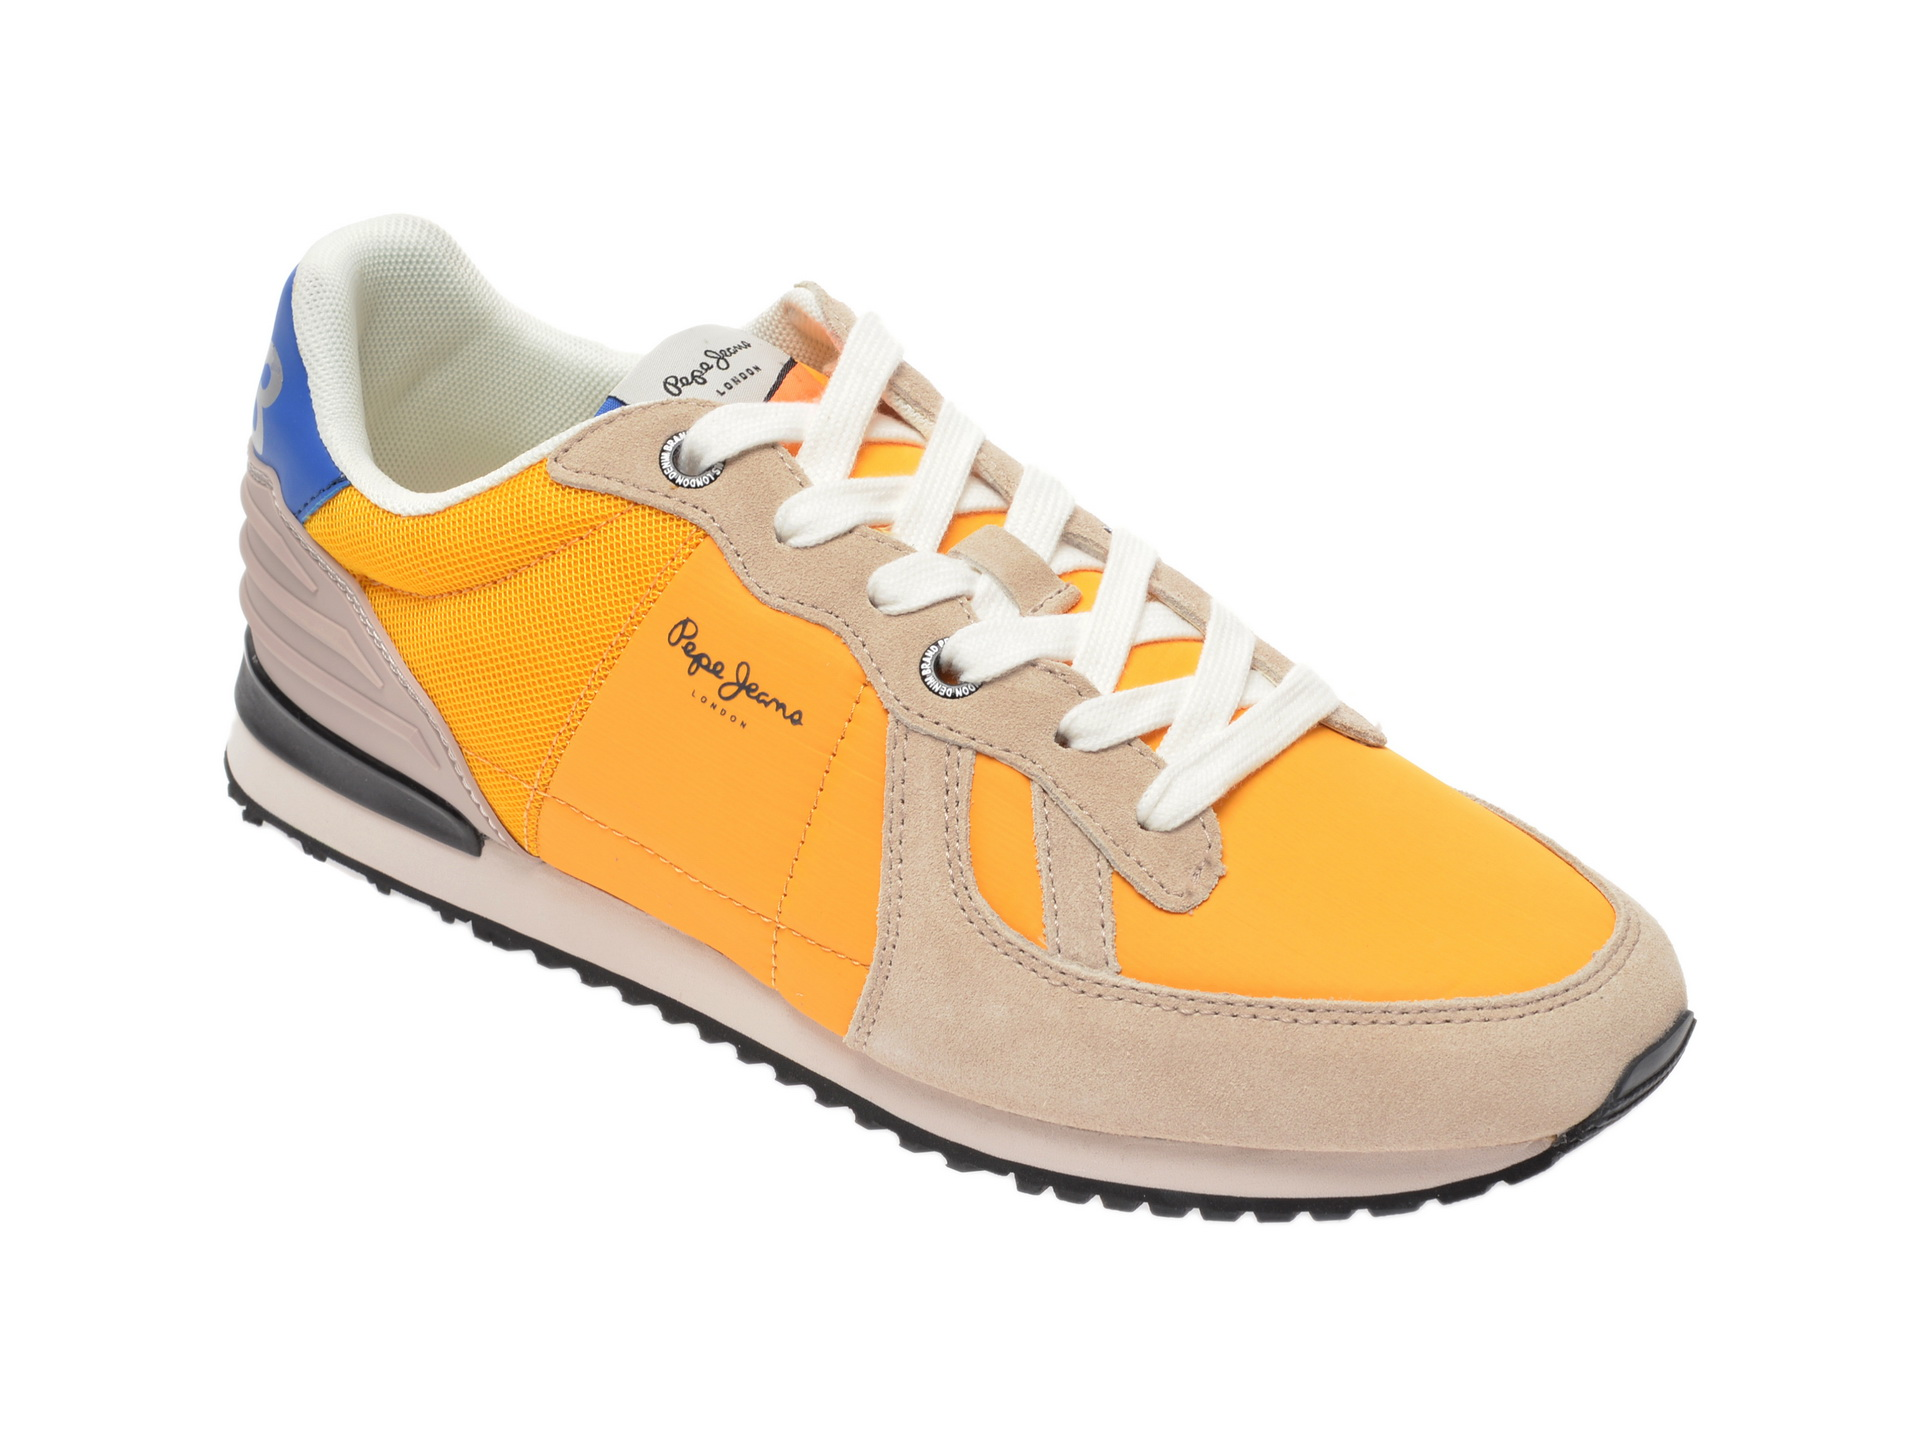 Pantofi sport PEPE JEANS galbeni, PMS30621, din material textil si piele intoarsa